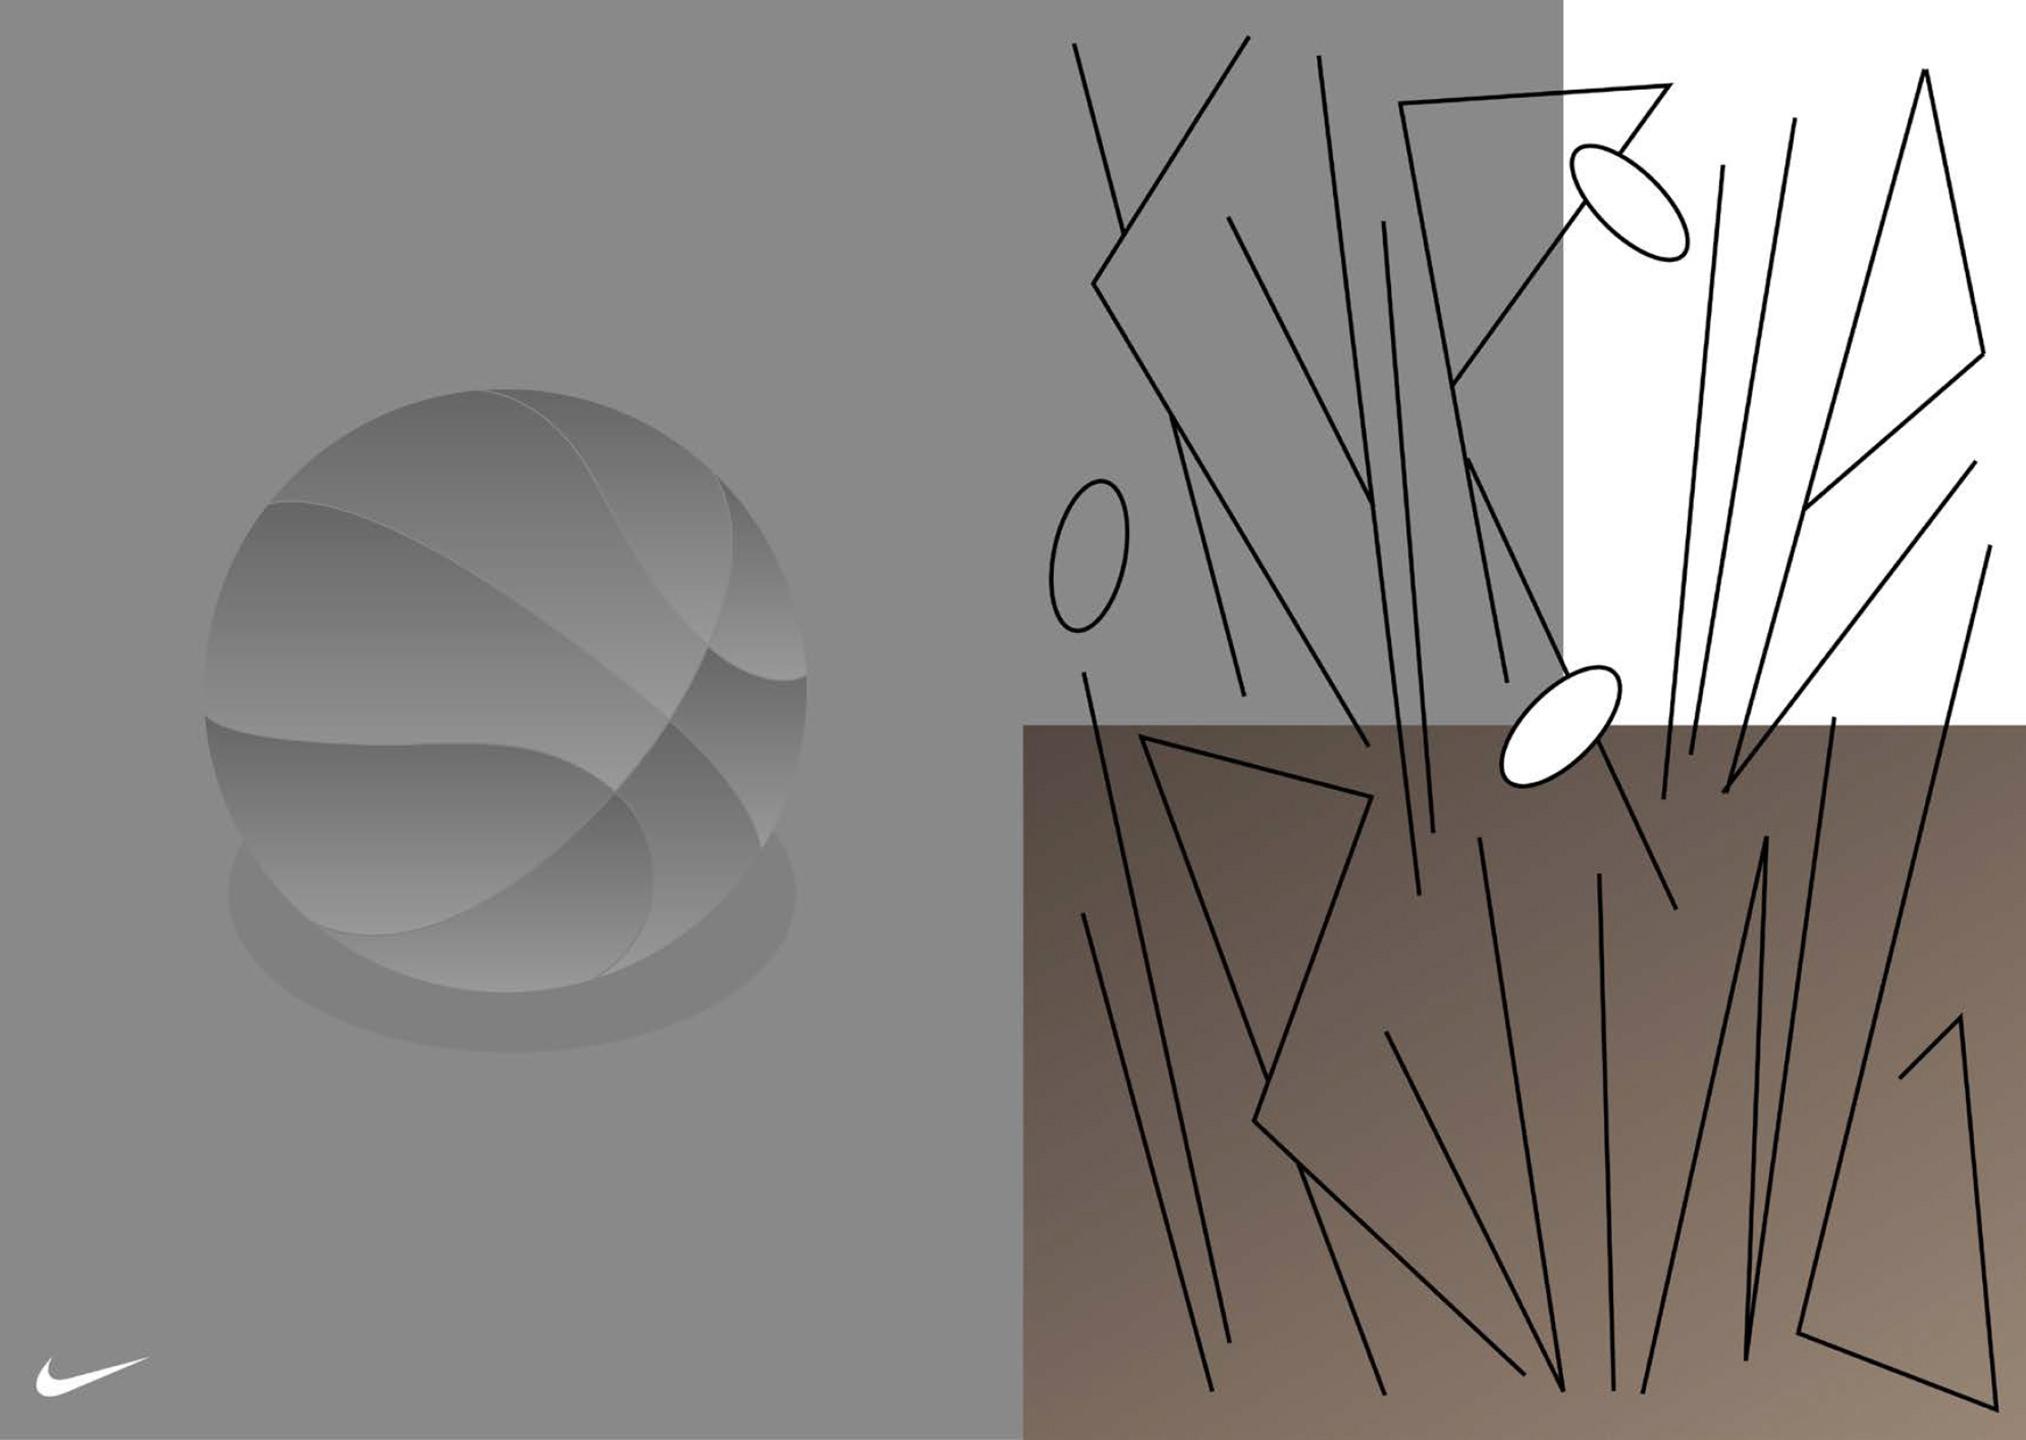 Design-Skizze innerhalb des Prozesses mit NIKE Basketball.